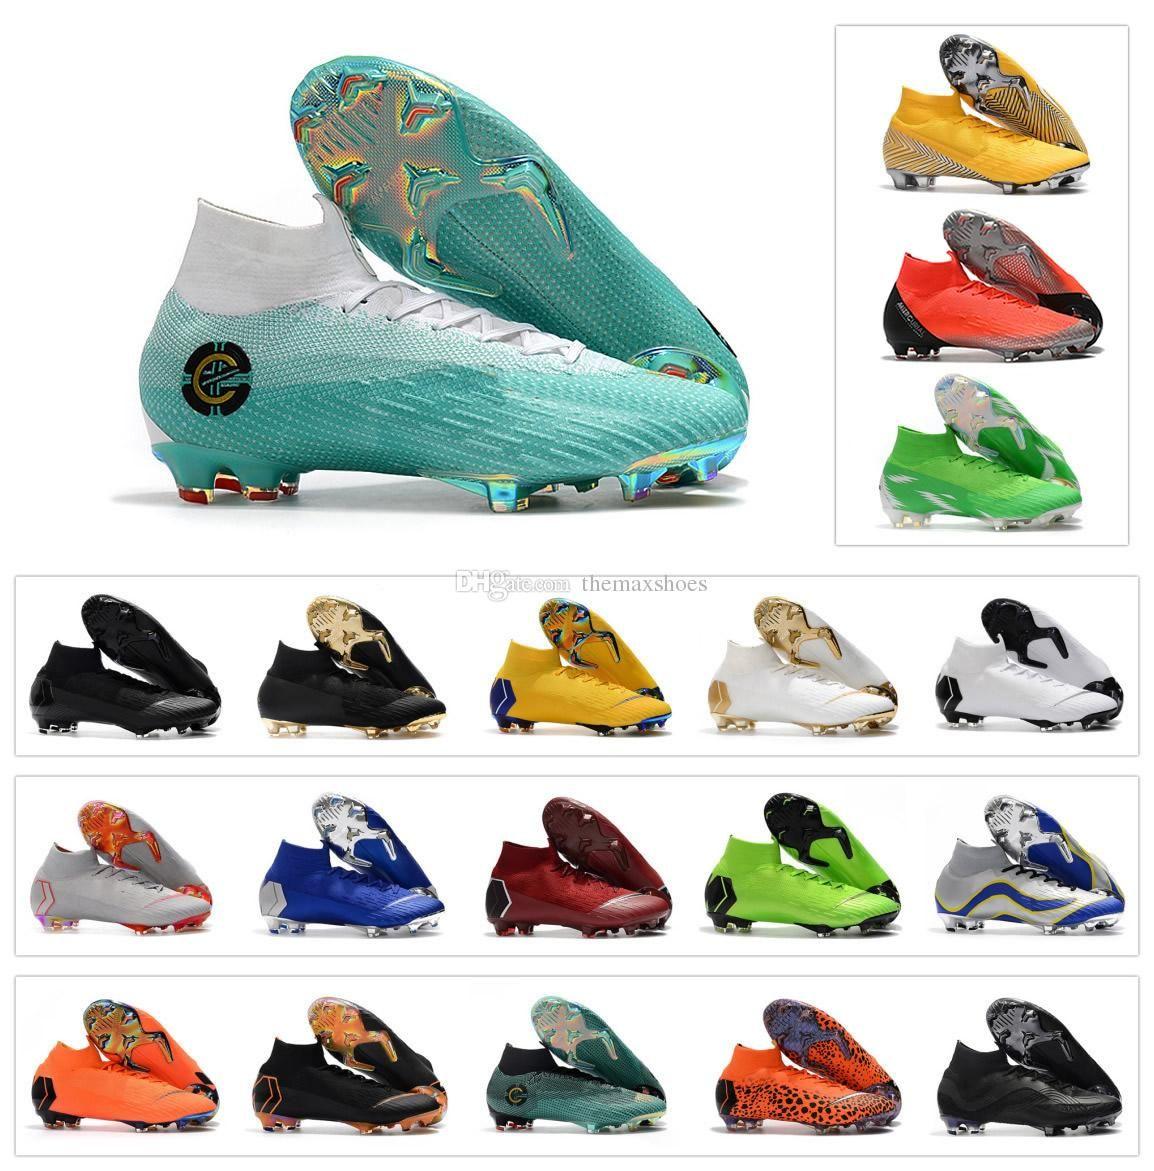 e22dffd13 2019 Hot Mercurial Superfly VI 360 Elite FG KJ 6 XII 12 CR7 Ronaldo Neymar  NJR Mens Women Boys High Ankle Soccer Shoes Football Boots Cleats From ...